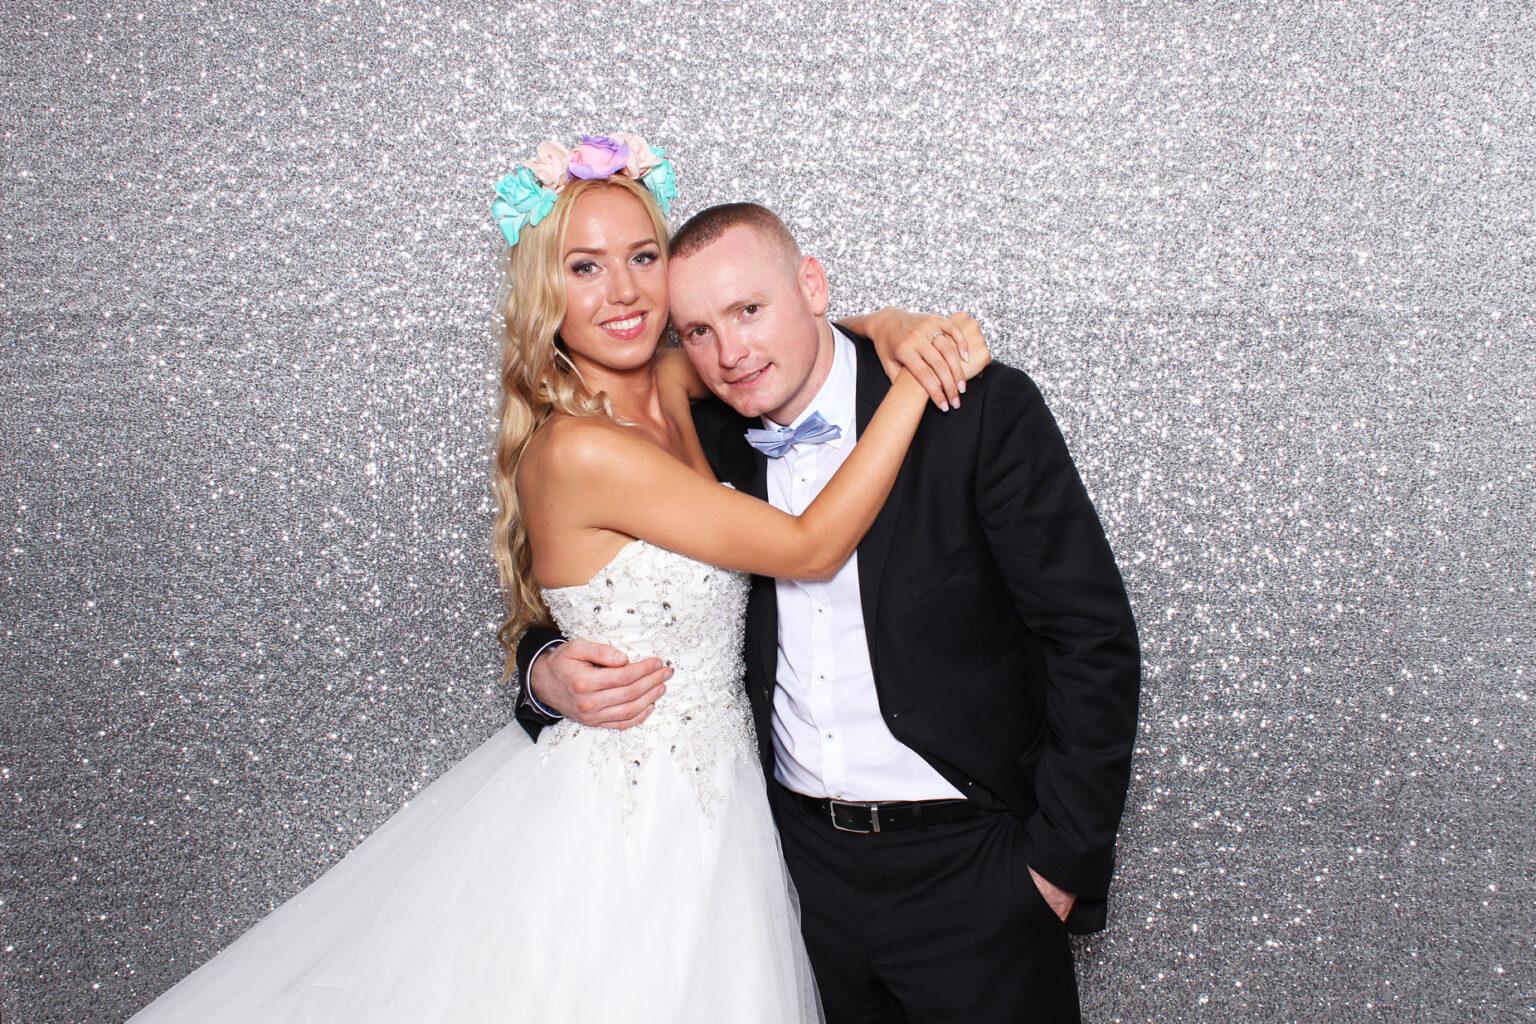 fotostena svadba bratislava fotokutik fotopozadie prenajom FOTOKÚTIK.sk